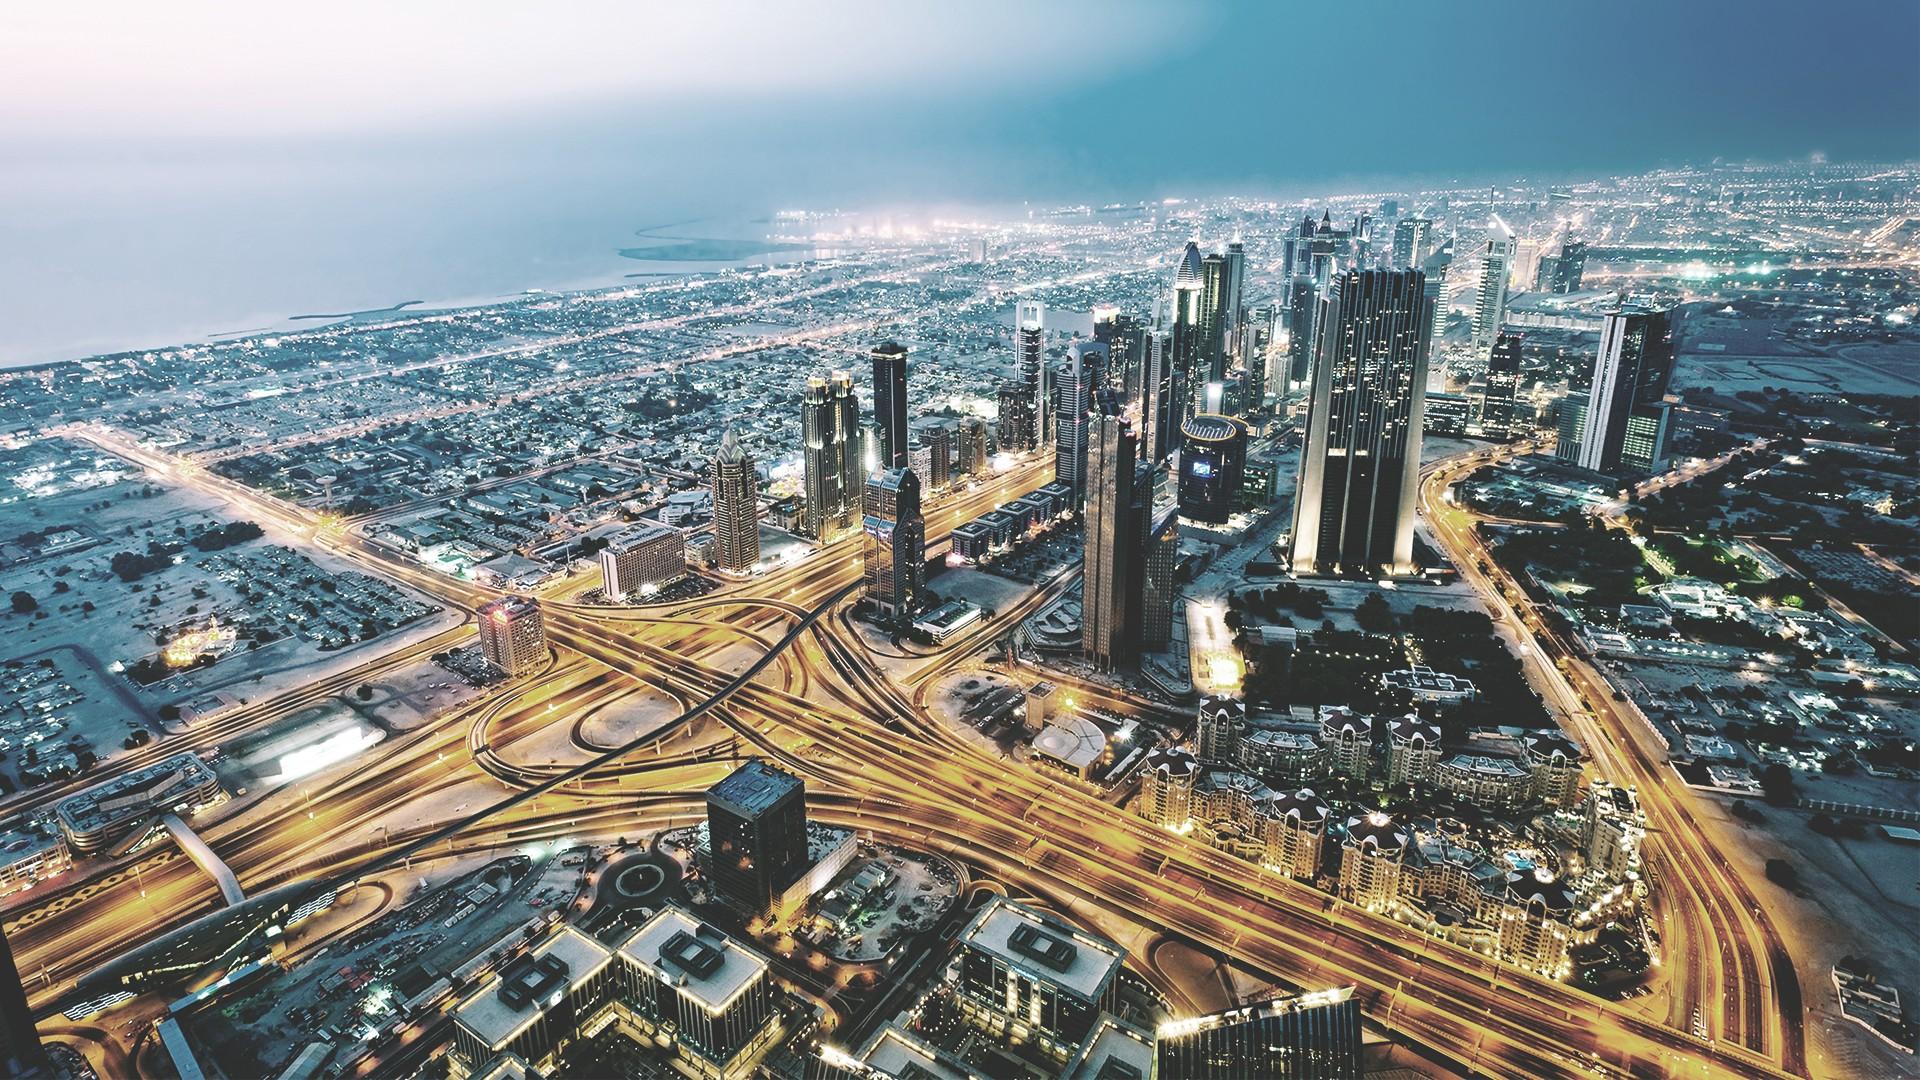 General 1920x1080 Dubai city cityscape night highway aerial view United Arab Emirates long exposure bird's eye view city lights